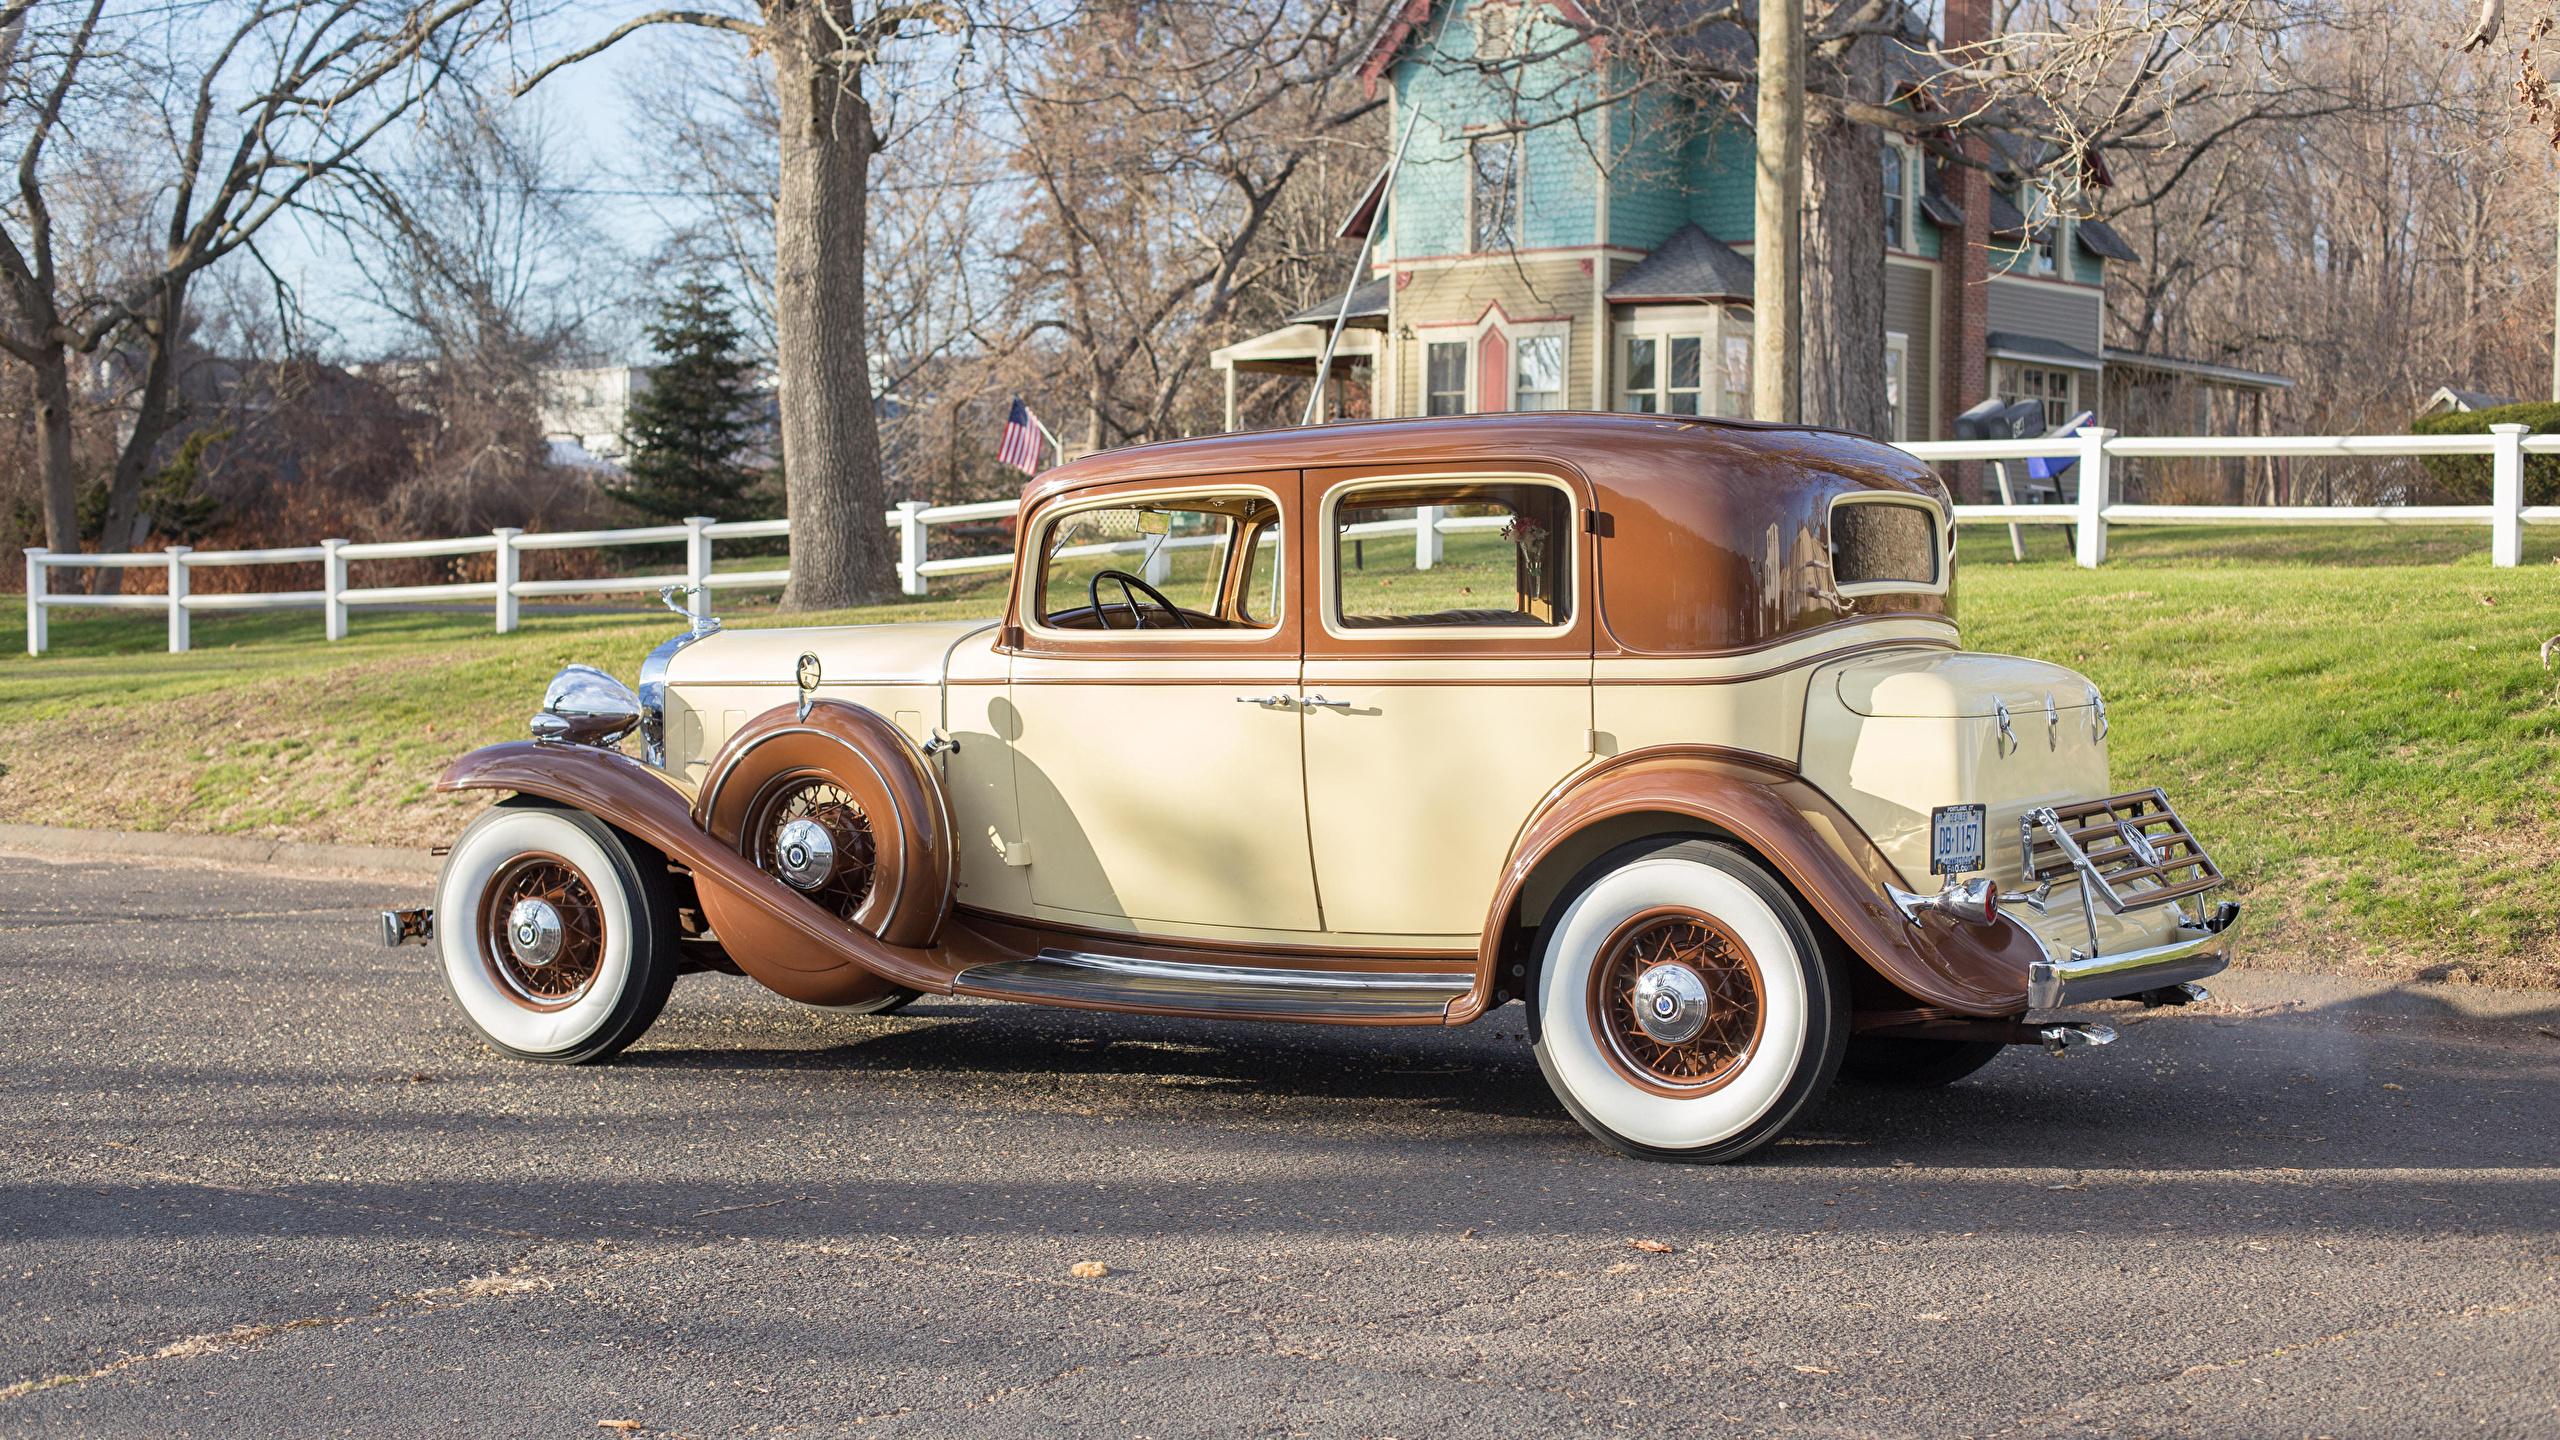 Картинка Cadillac 1932 V12 370-B Town Sedan by Fisher Сбоку Автомобили 2560x1440 Кадиллак авто машины машина автомобиль